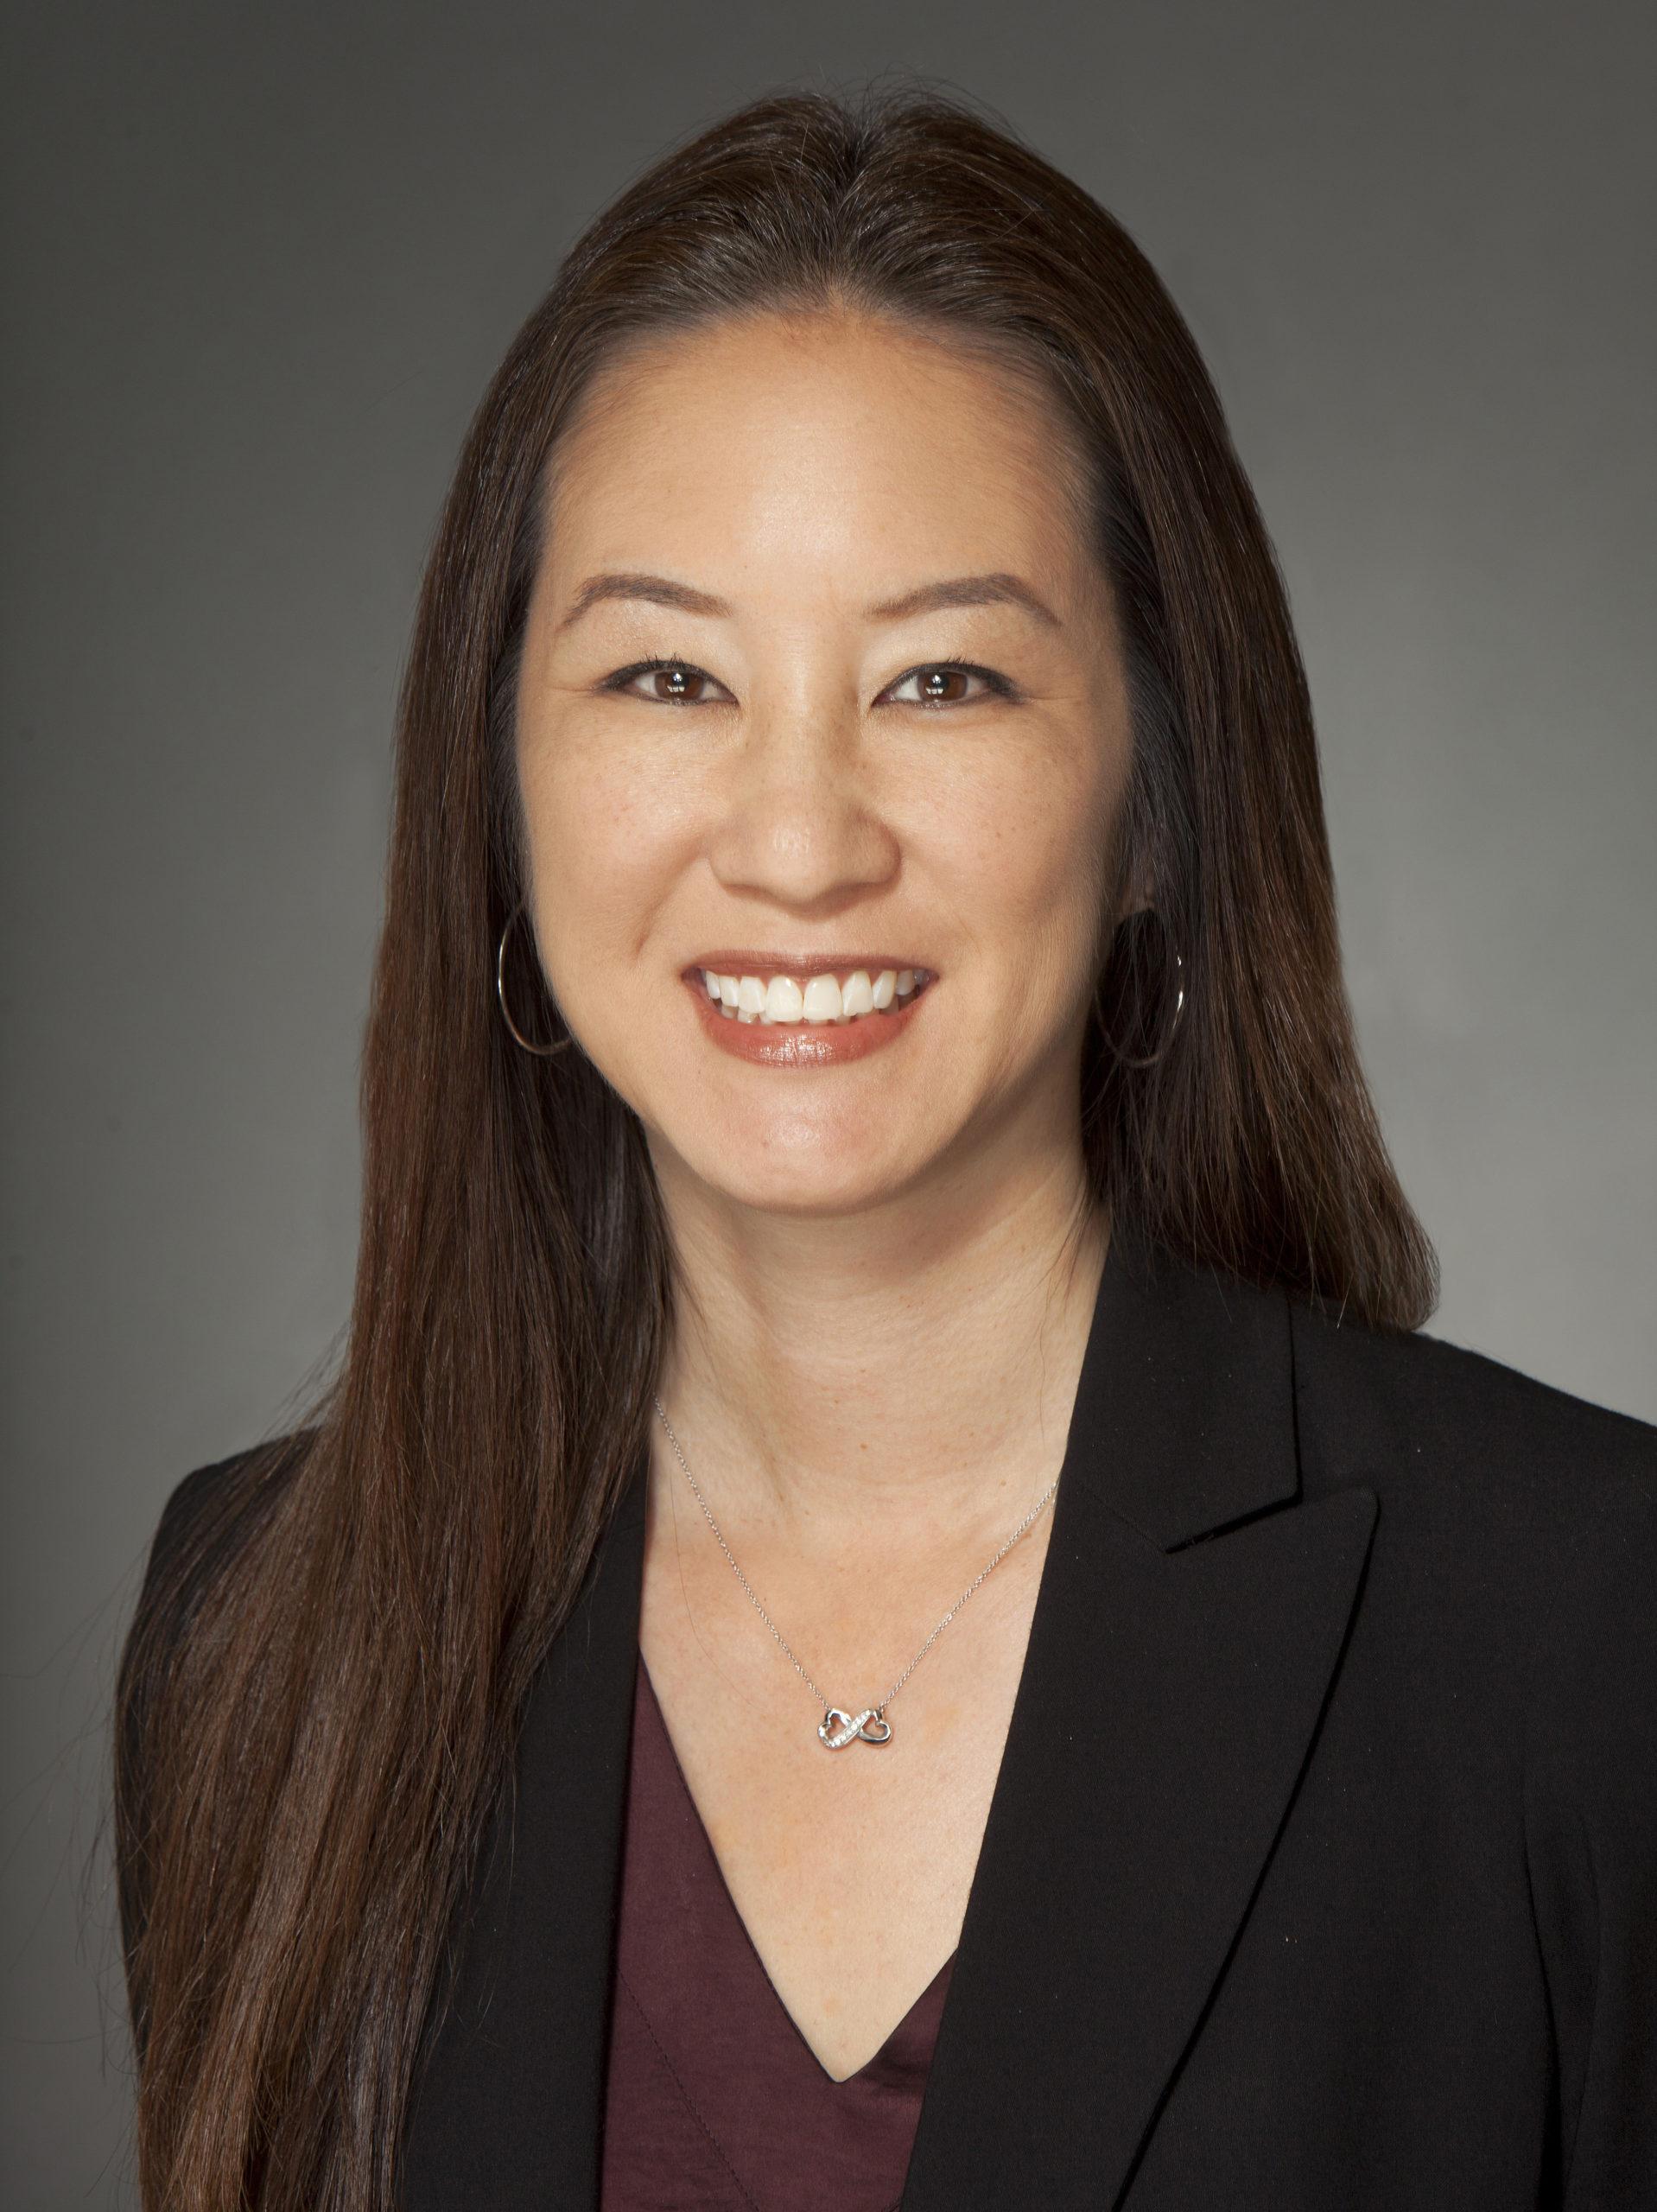 Jill Yoshimi portrait